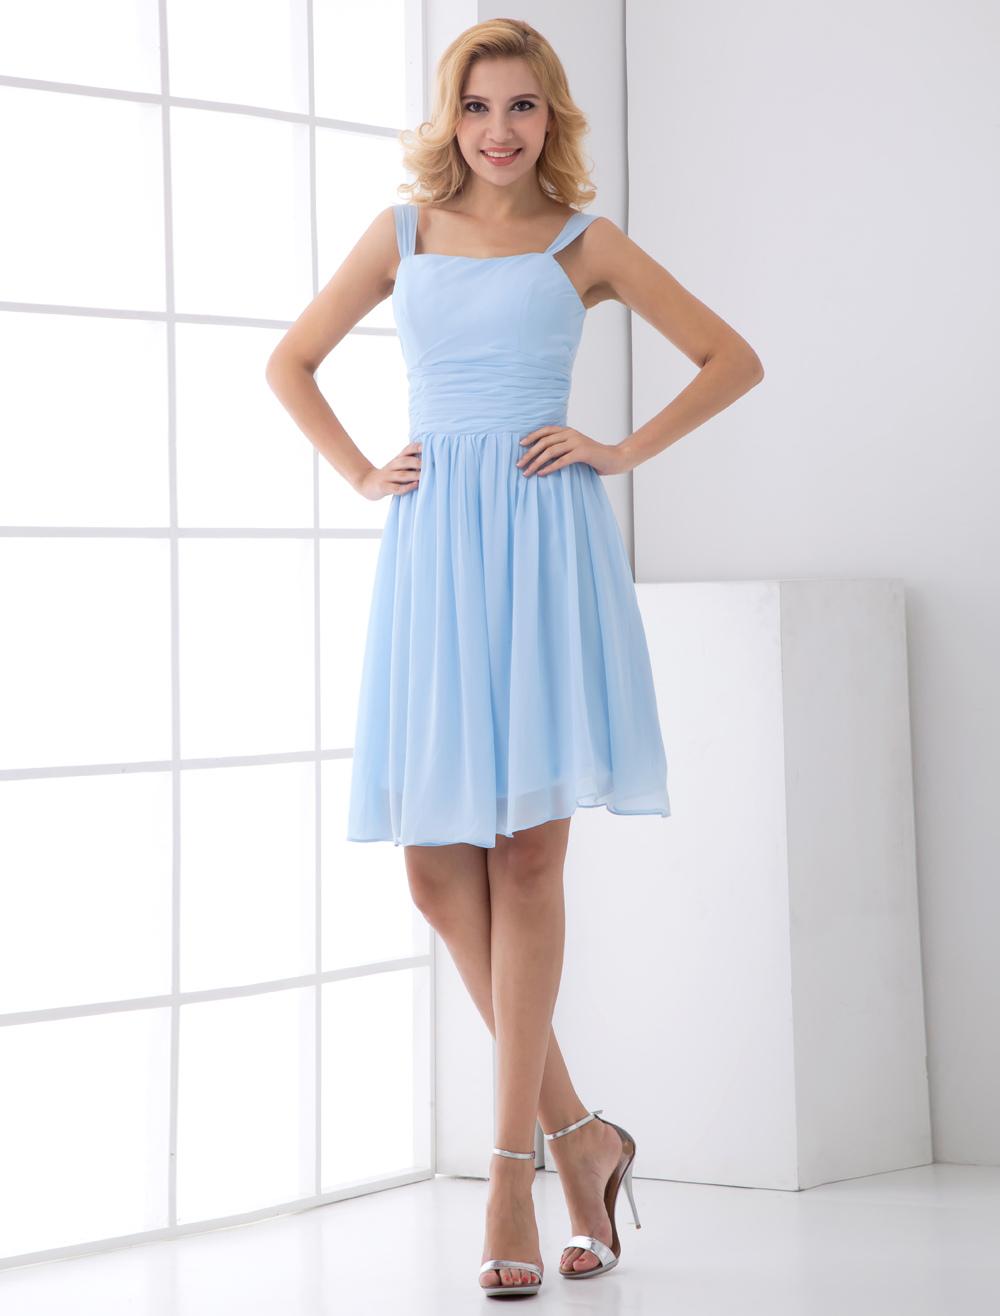 Chiffon Bridesmaid Dress Short Sleeveless Wedding Party Dress Ruched Baby Blue Prom Dress